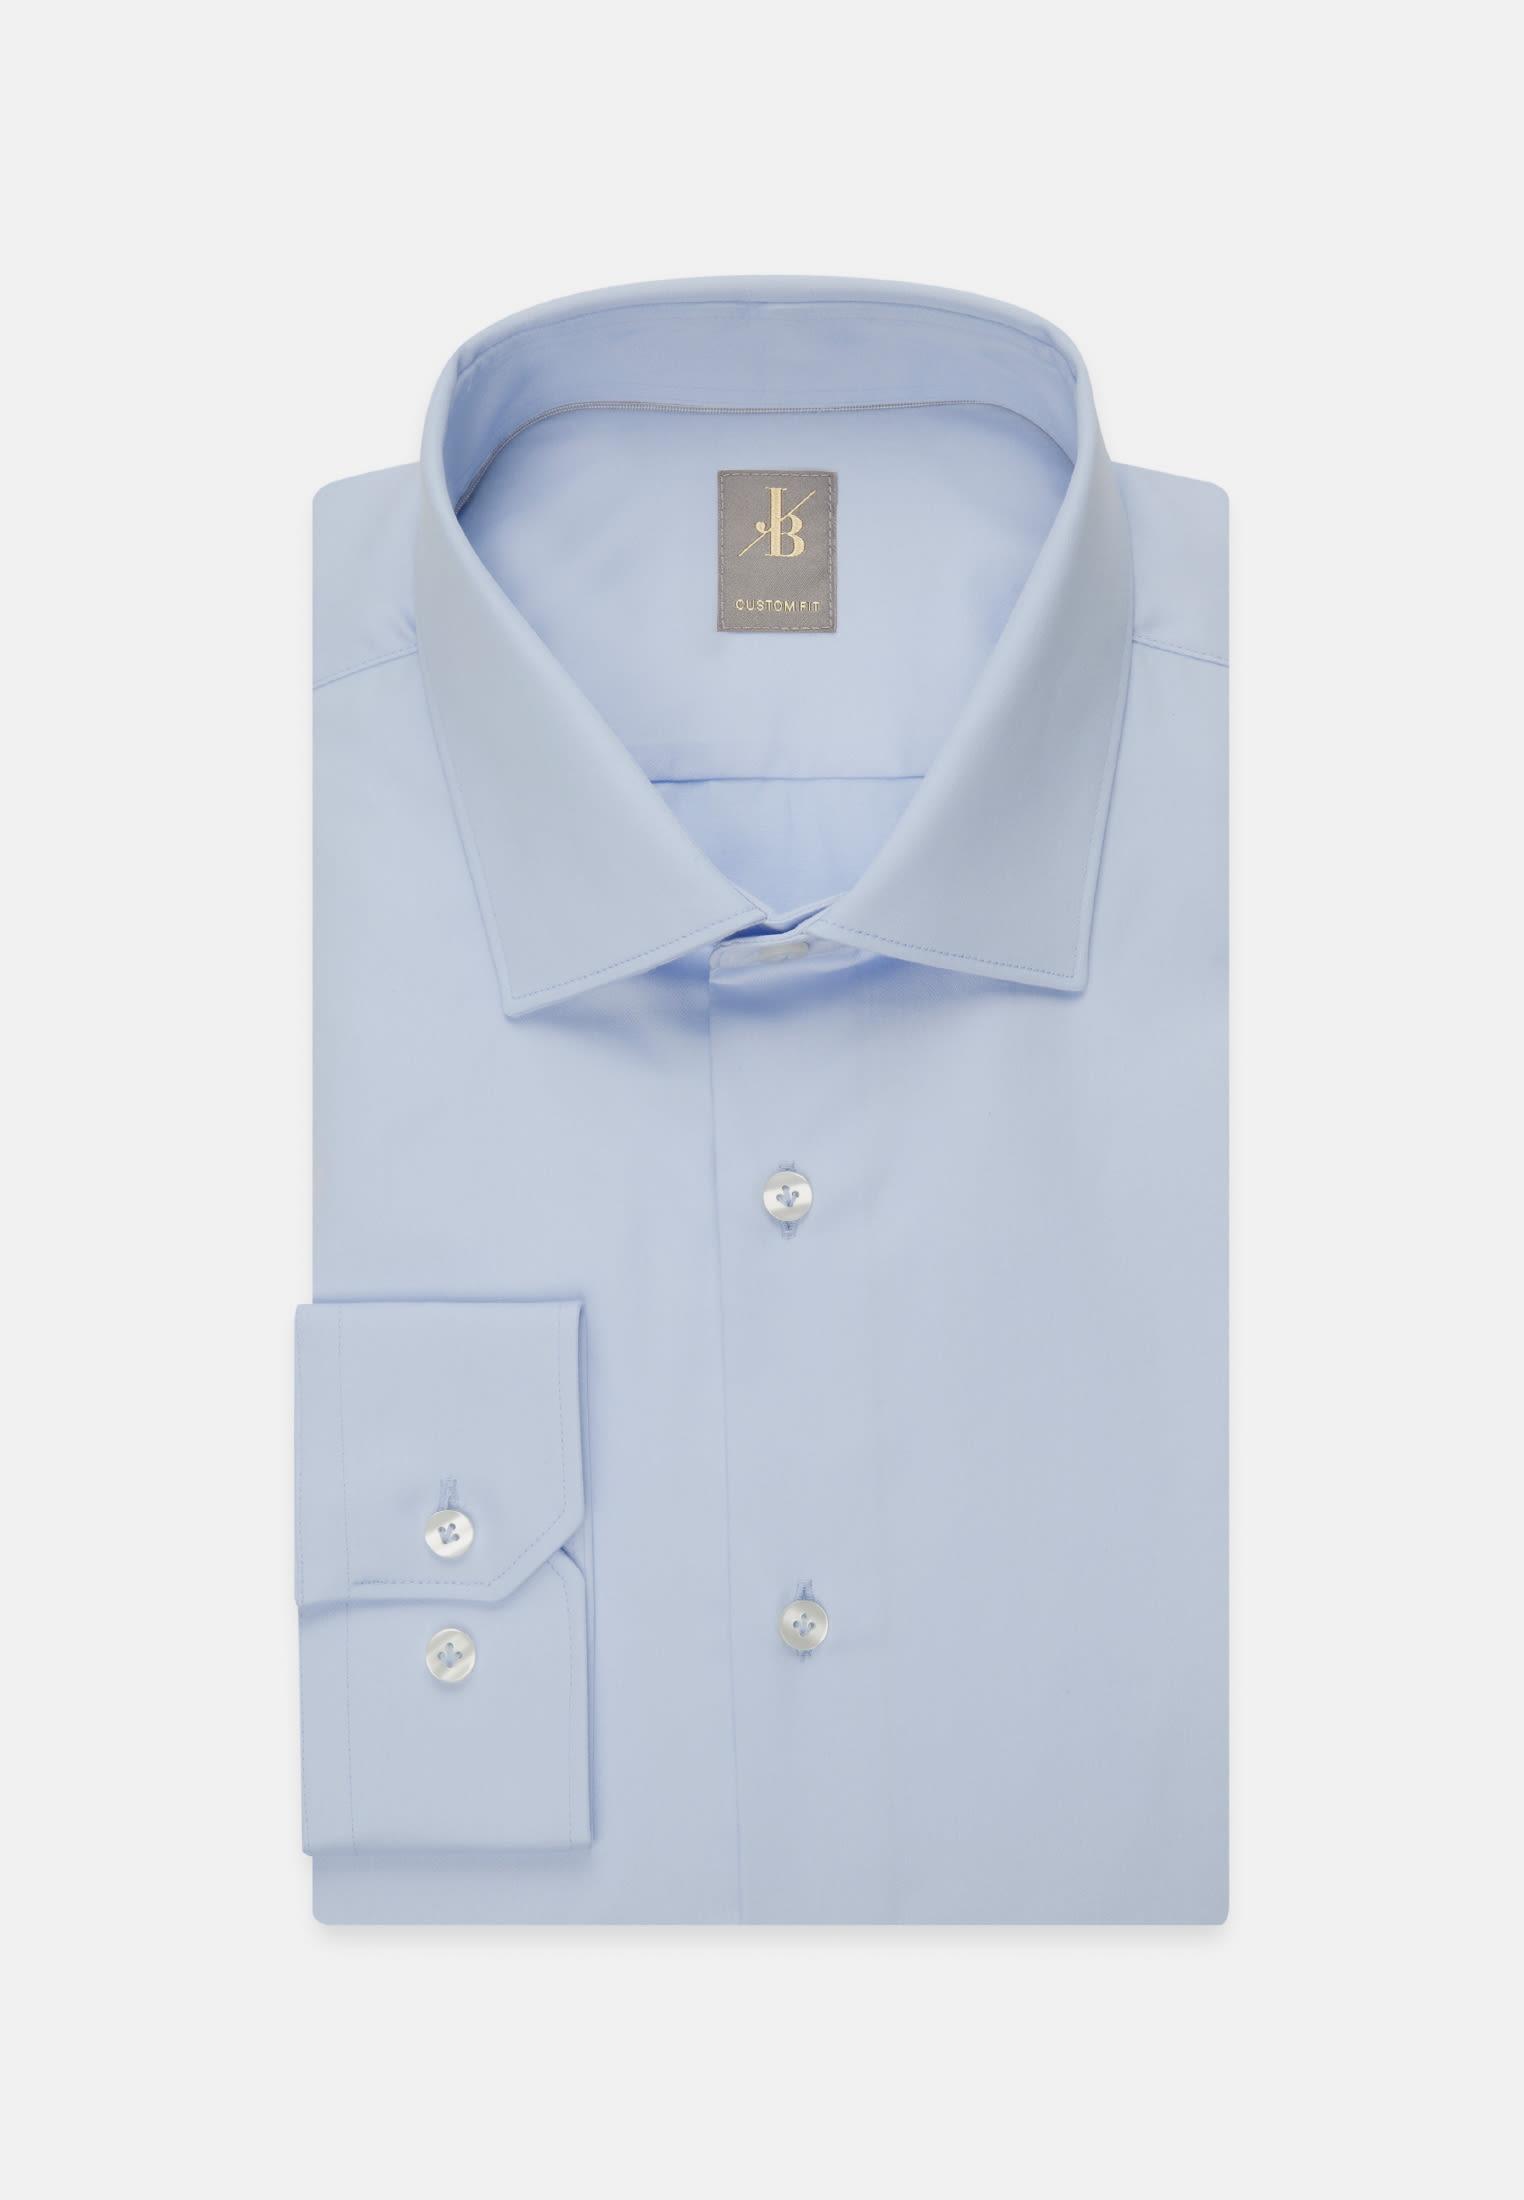 Satin Business Hemd in Custom Fit mit Kentkragen in Hellblau    Jacques Britt Onlineshop